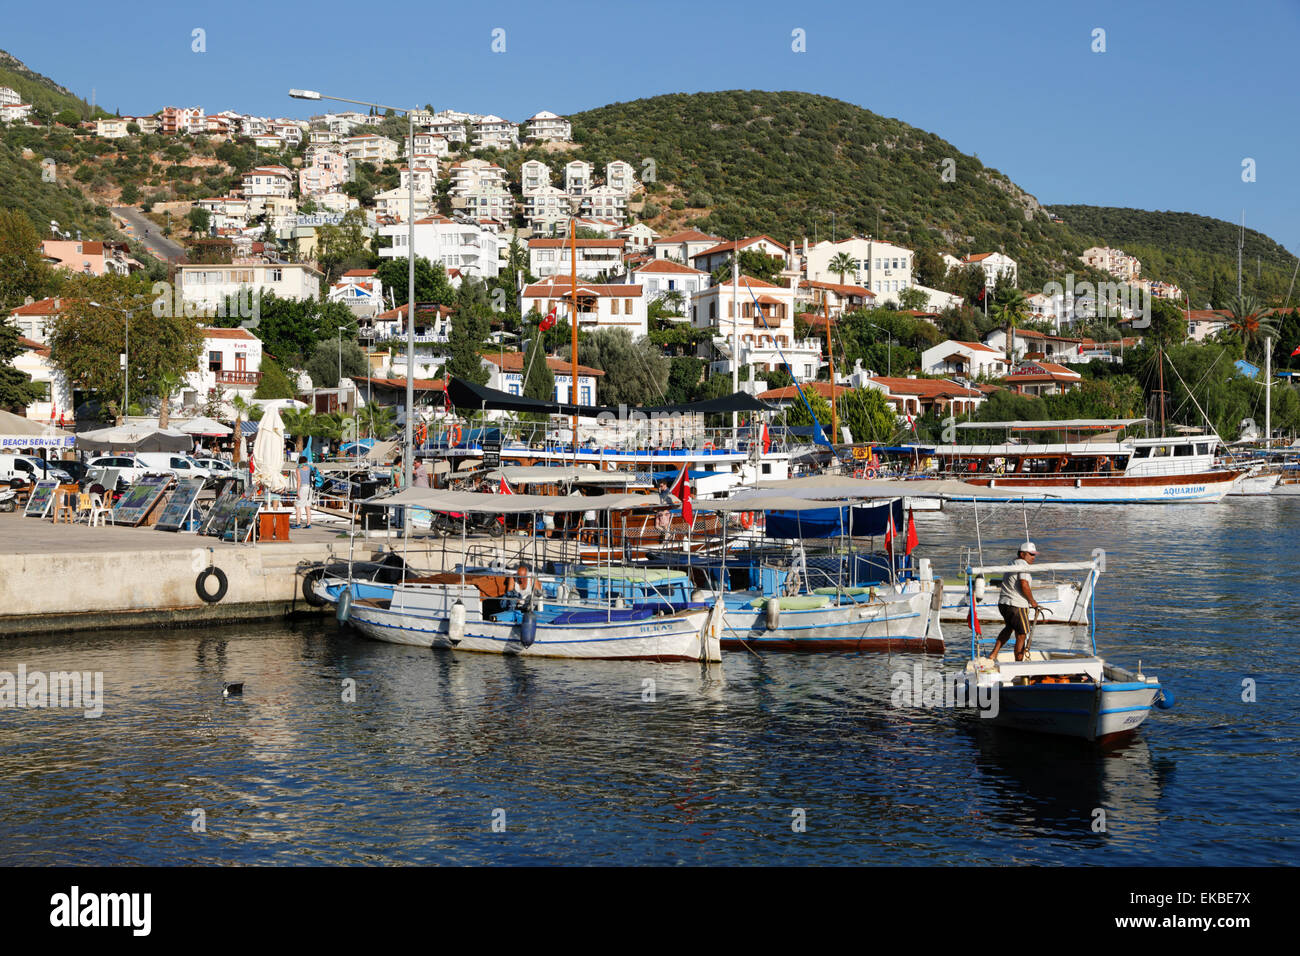 Fishing boats in harbour, Kas, Lycia, Antalya Province, Mediterranean Coast, Southwest Turkey, Turkey, Asia Minor, - Stock Image